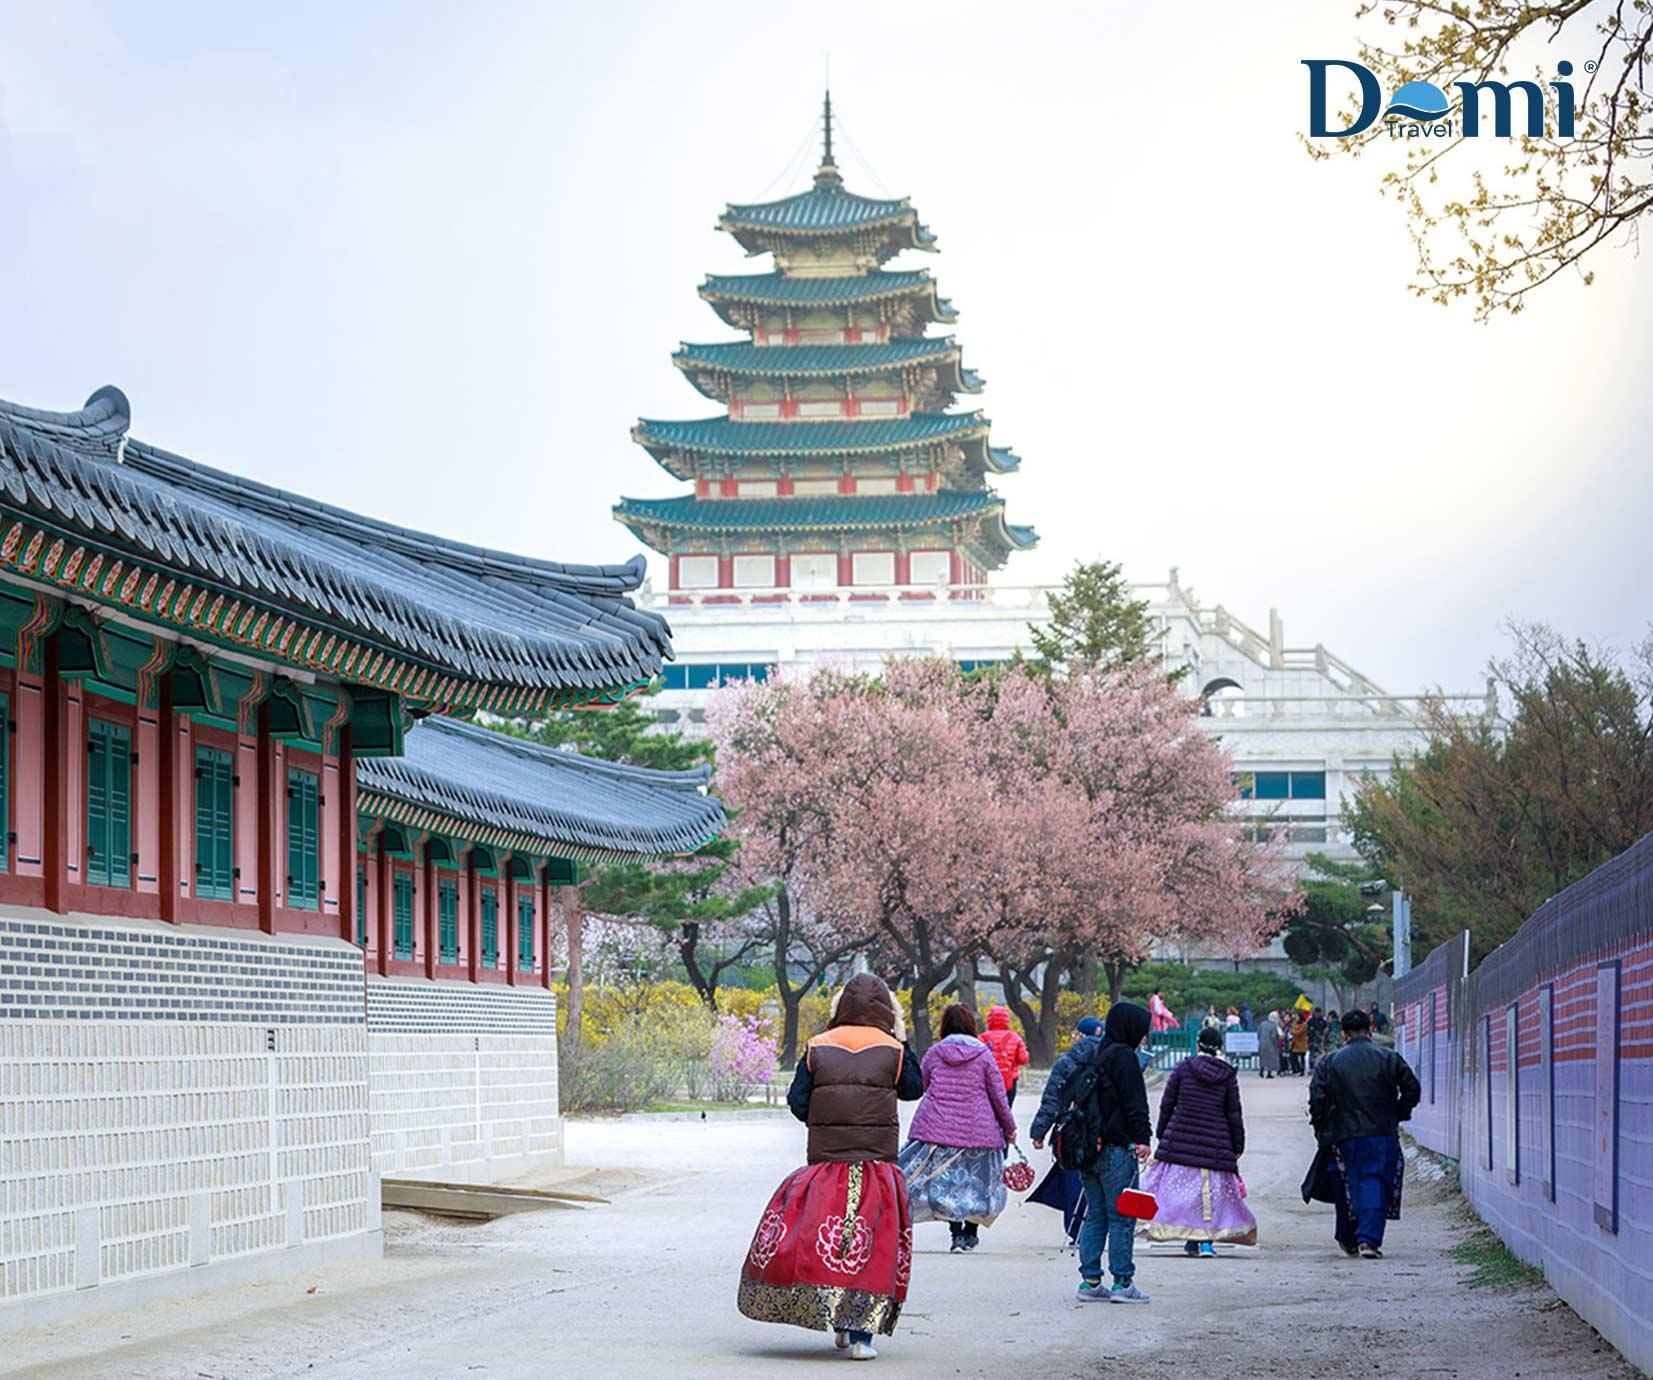 TOUR DU LỊCH HÀN QUỐC – SEOUL – NAMI LOTTE WORLD 4N4Đ